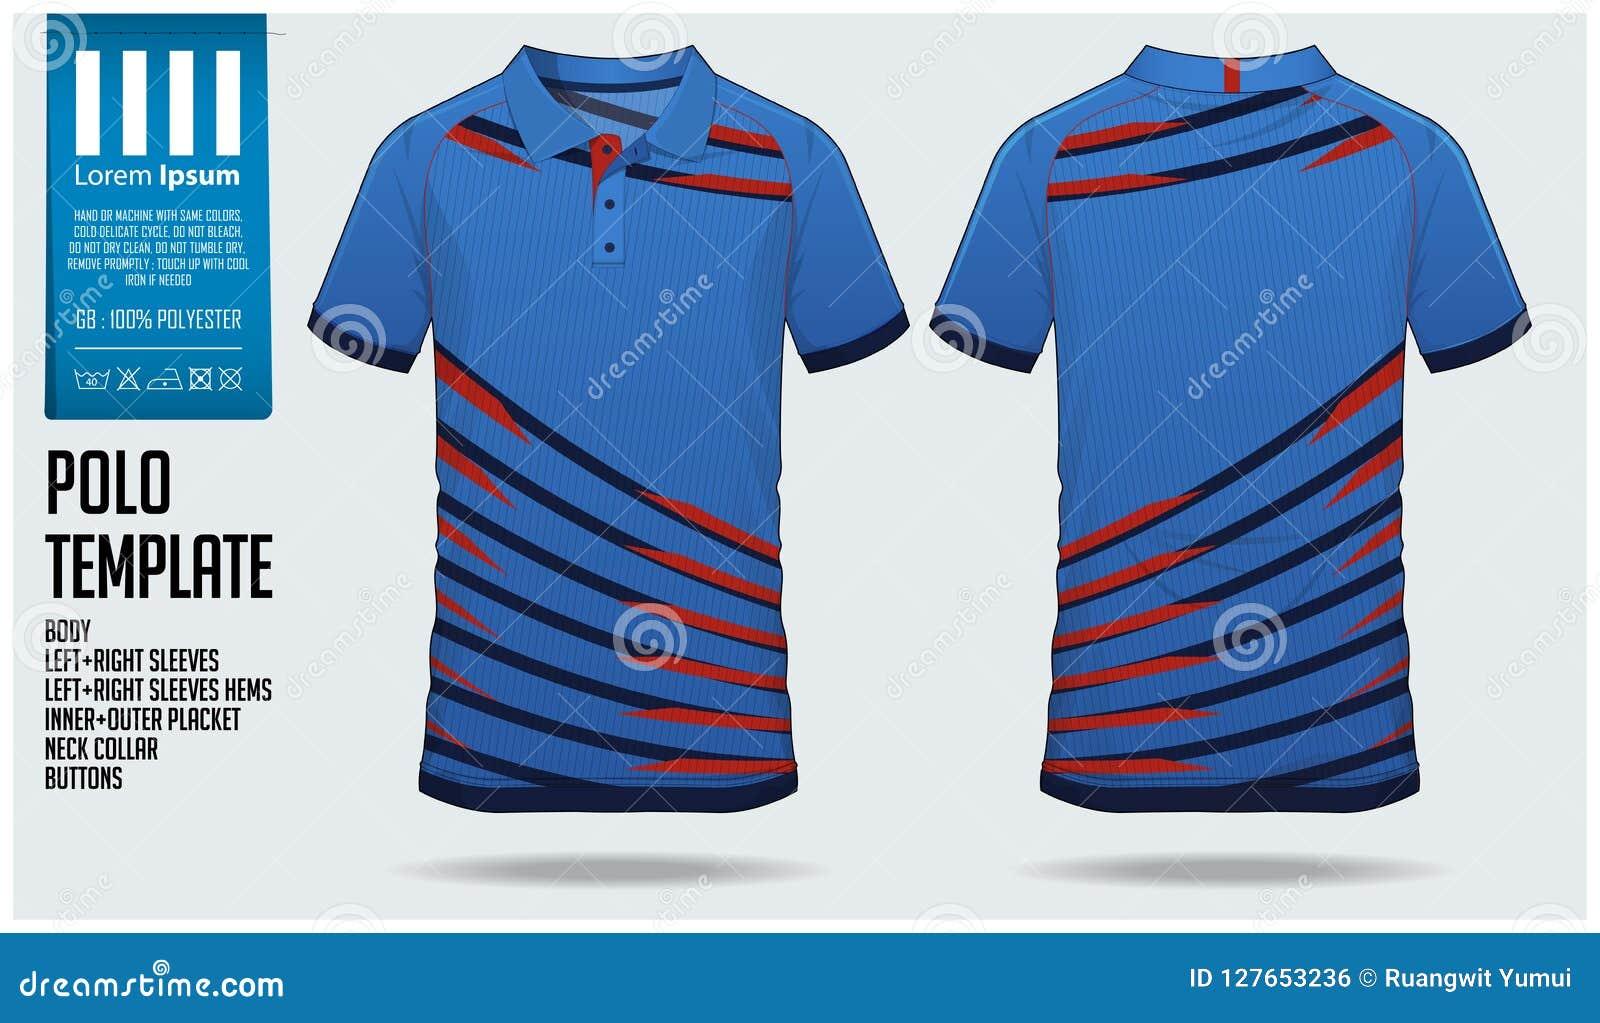 polo t shirt sport design template for soccer jersey football kit